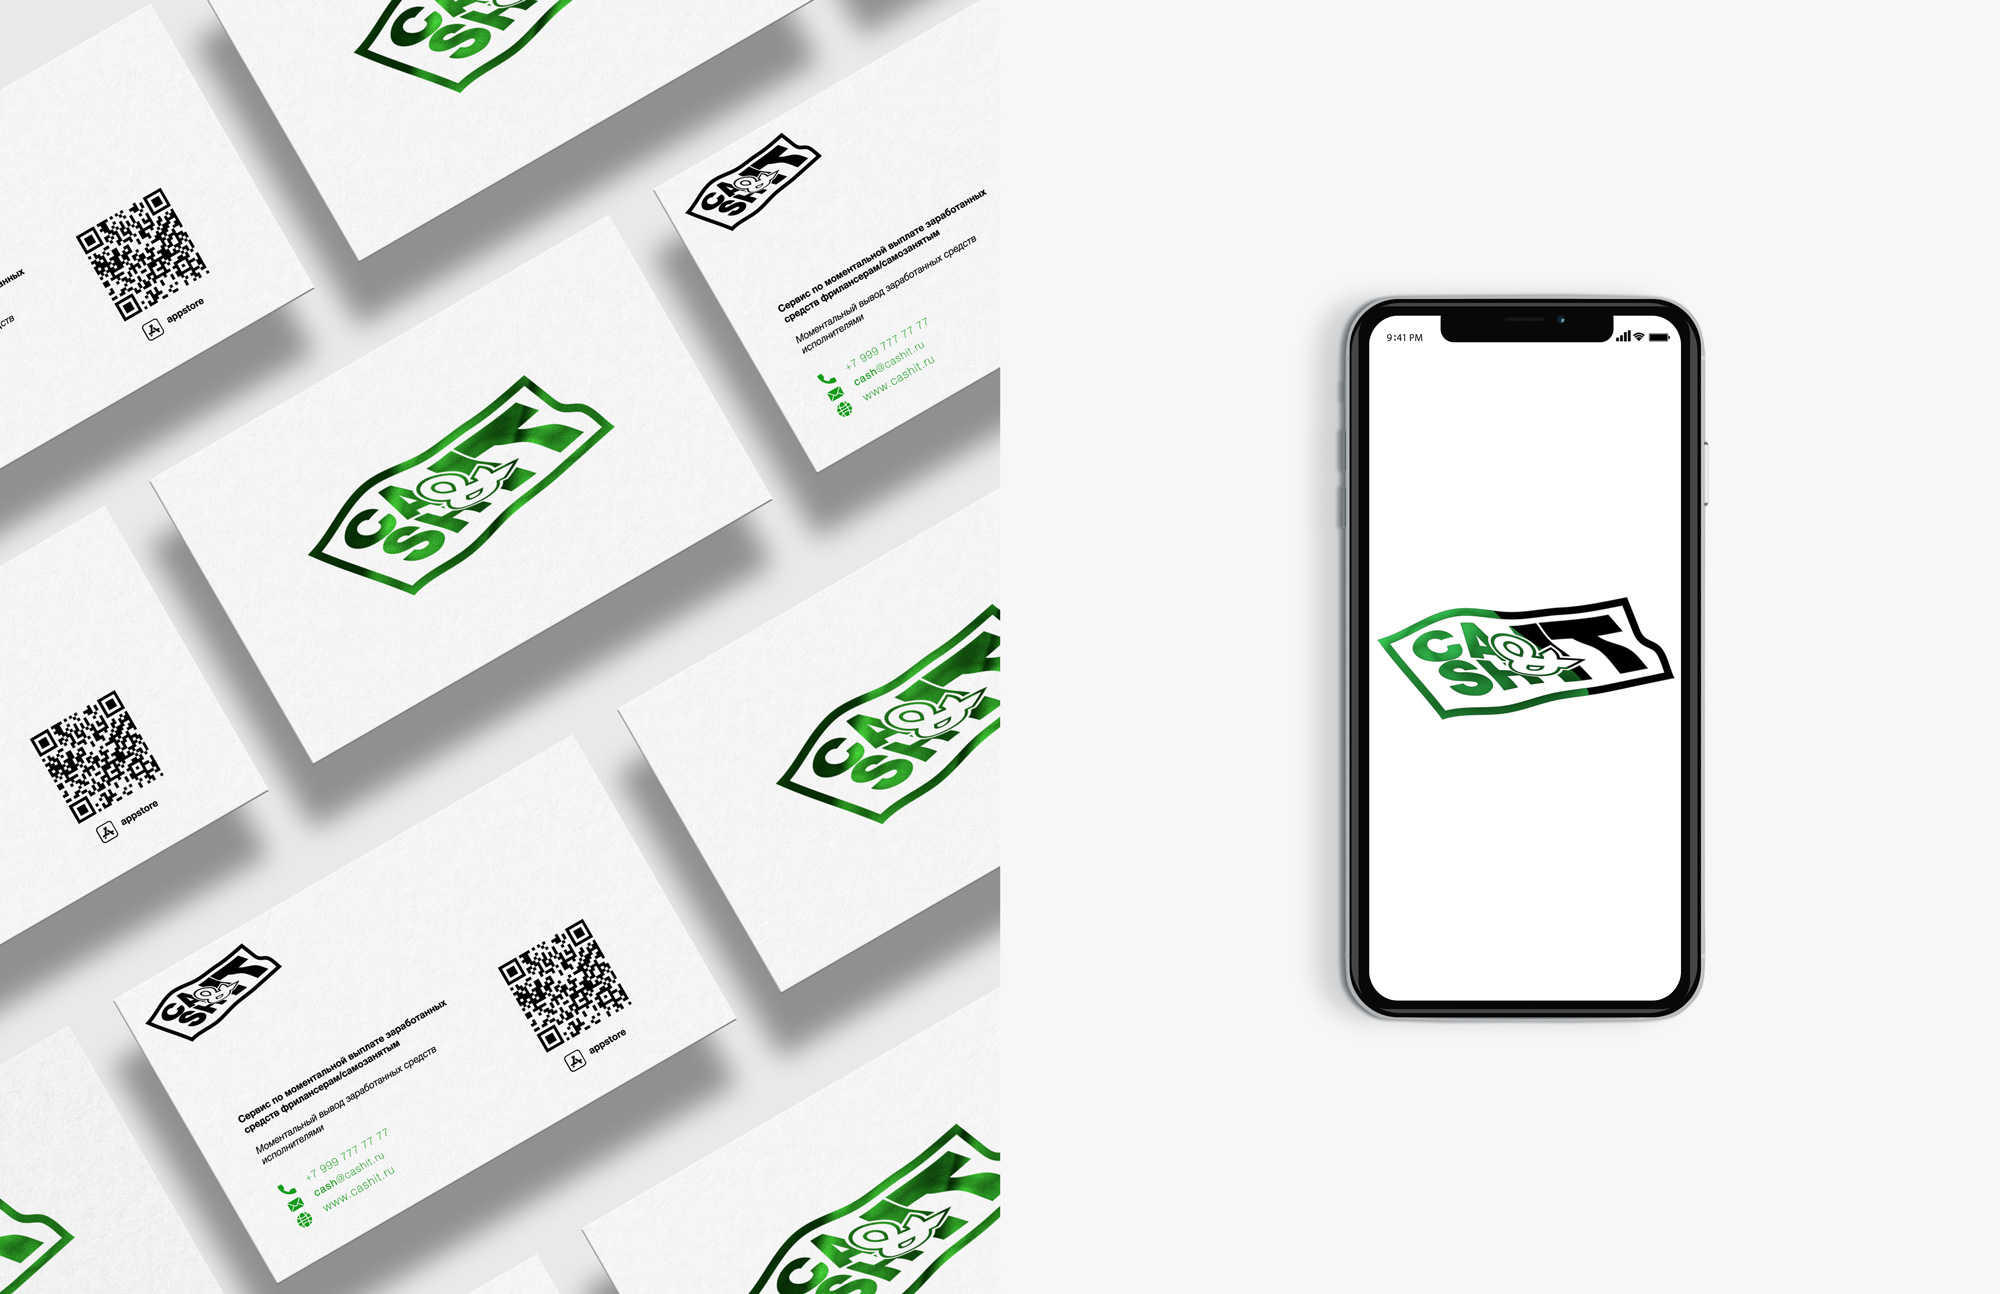 Логотип для Cash & IT - сервис доставки денег фото f_2545fd8eecdc8cc3.jpg